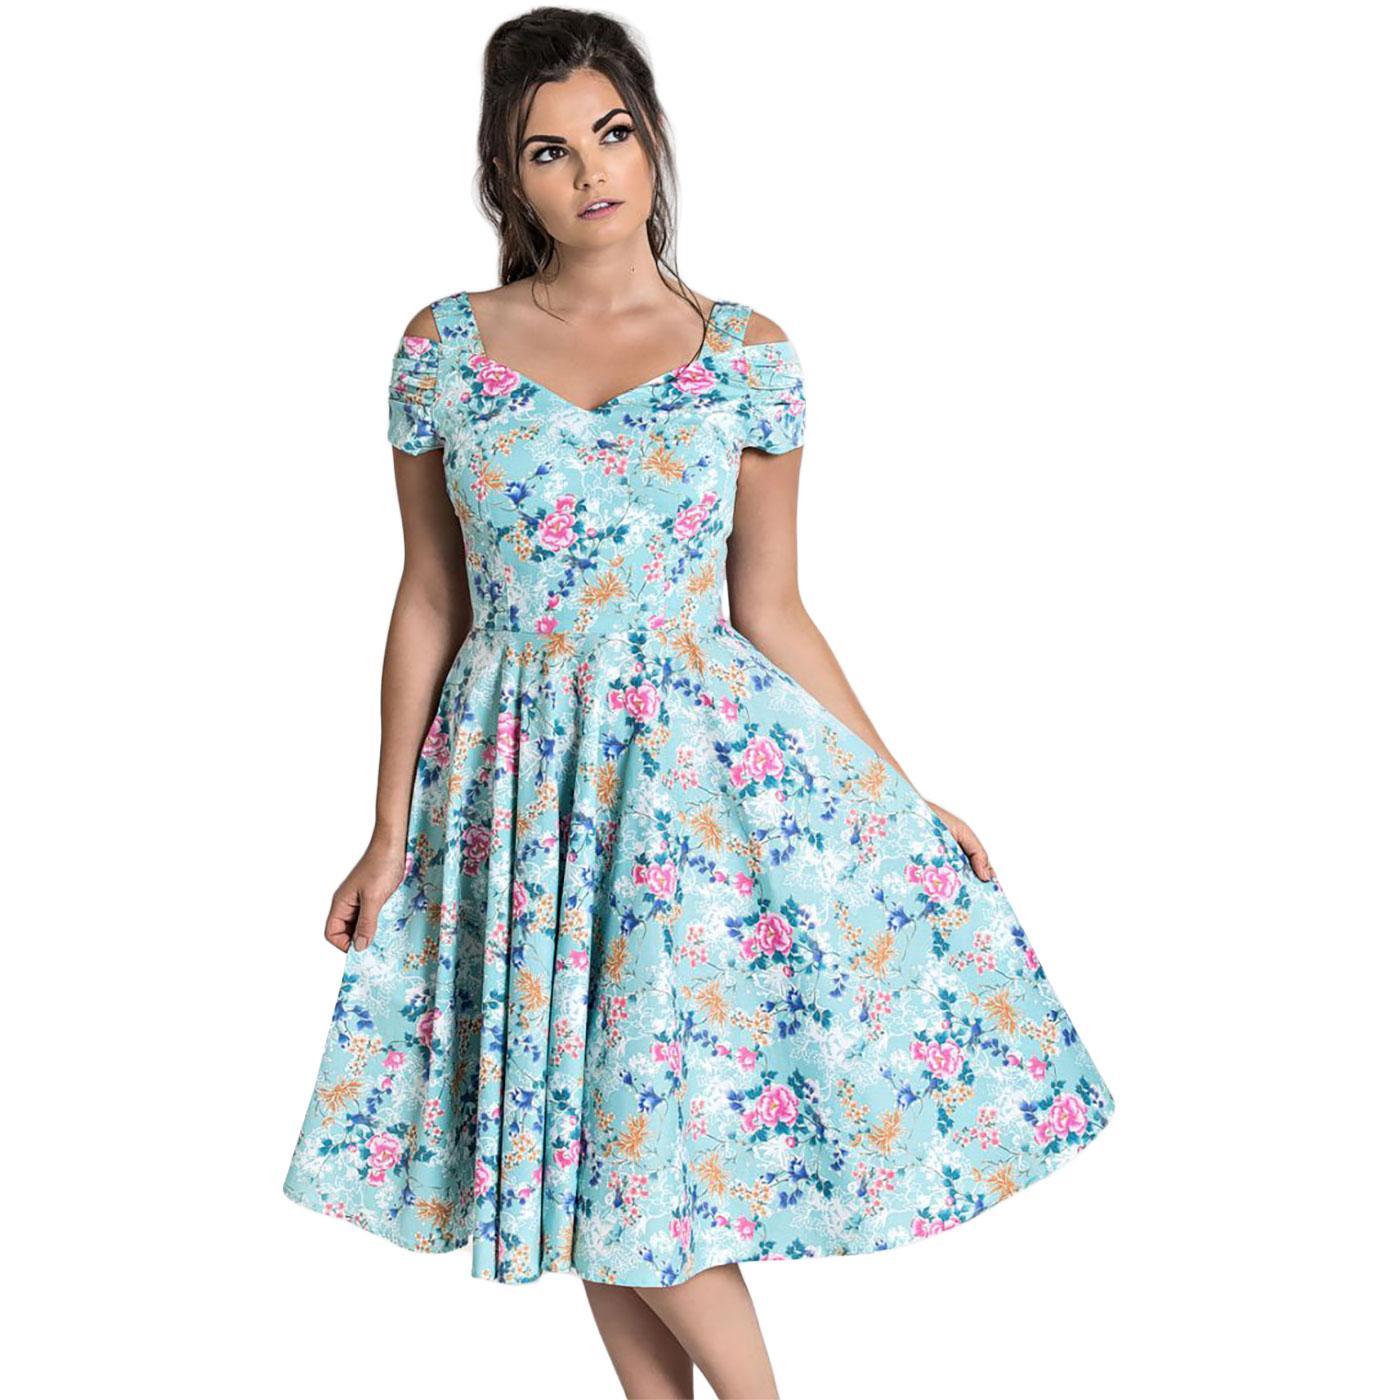 Yoko HELL BUNNY 50's Vintage Pastel Floral Dress